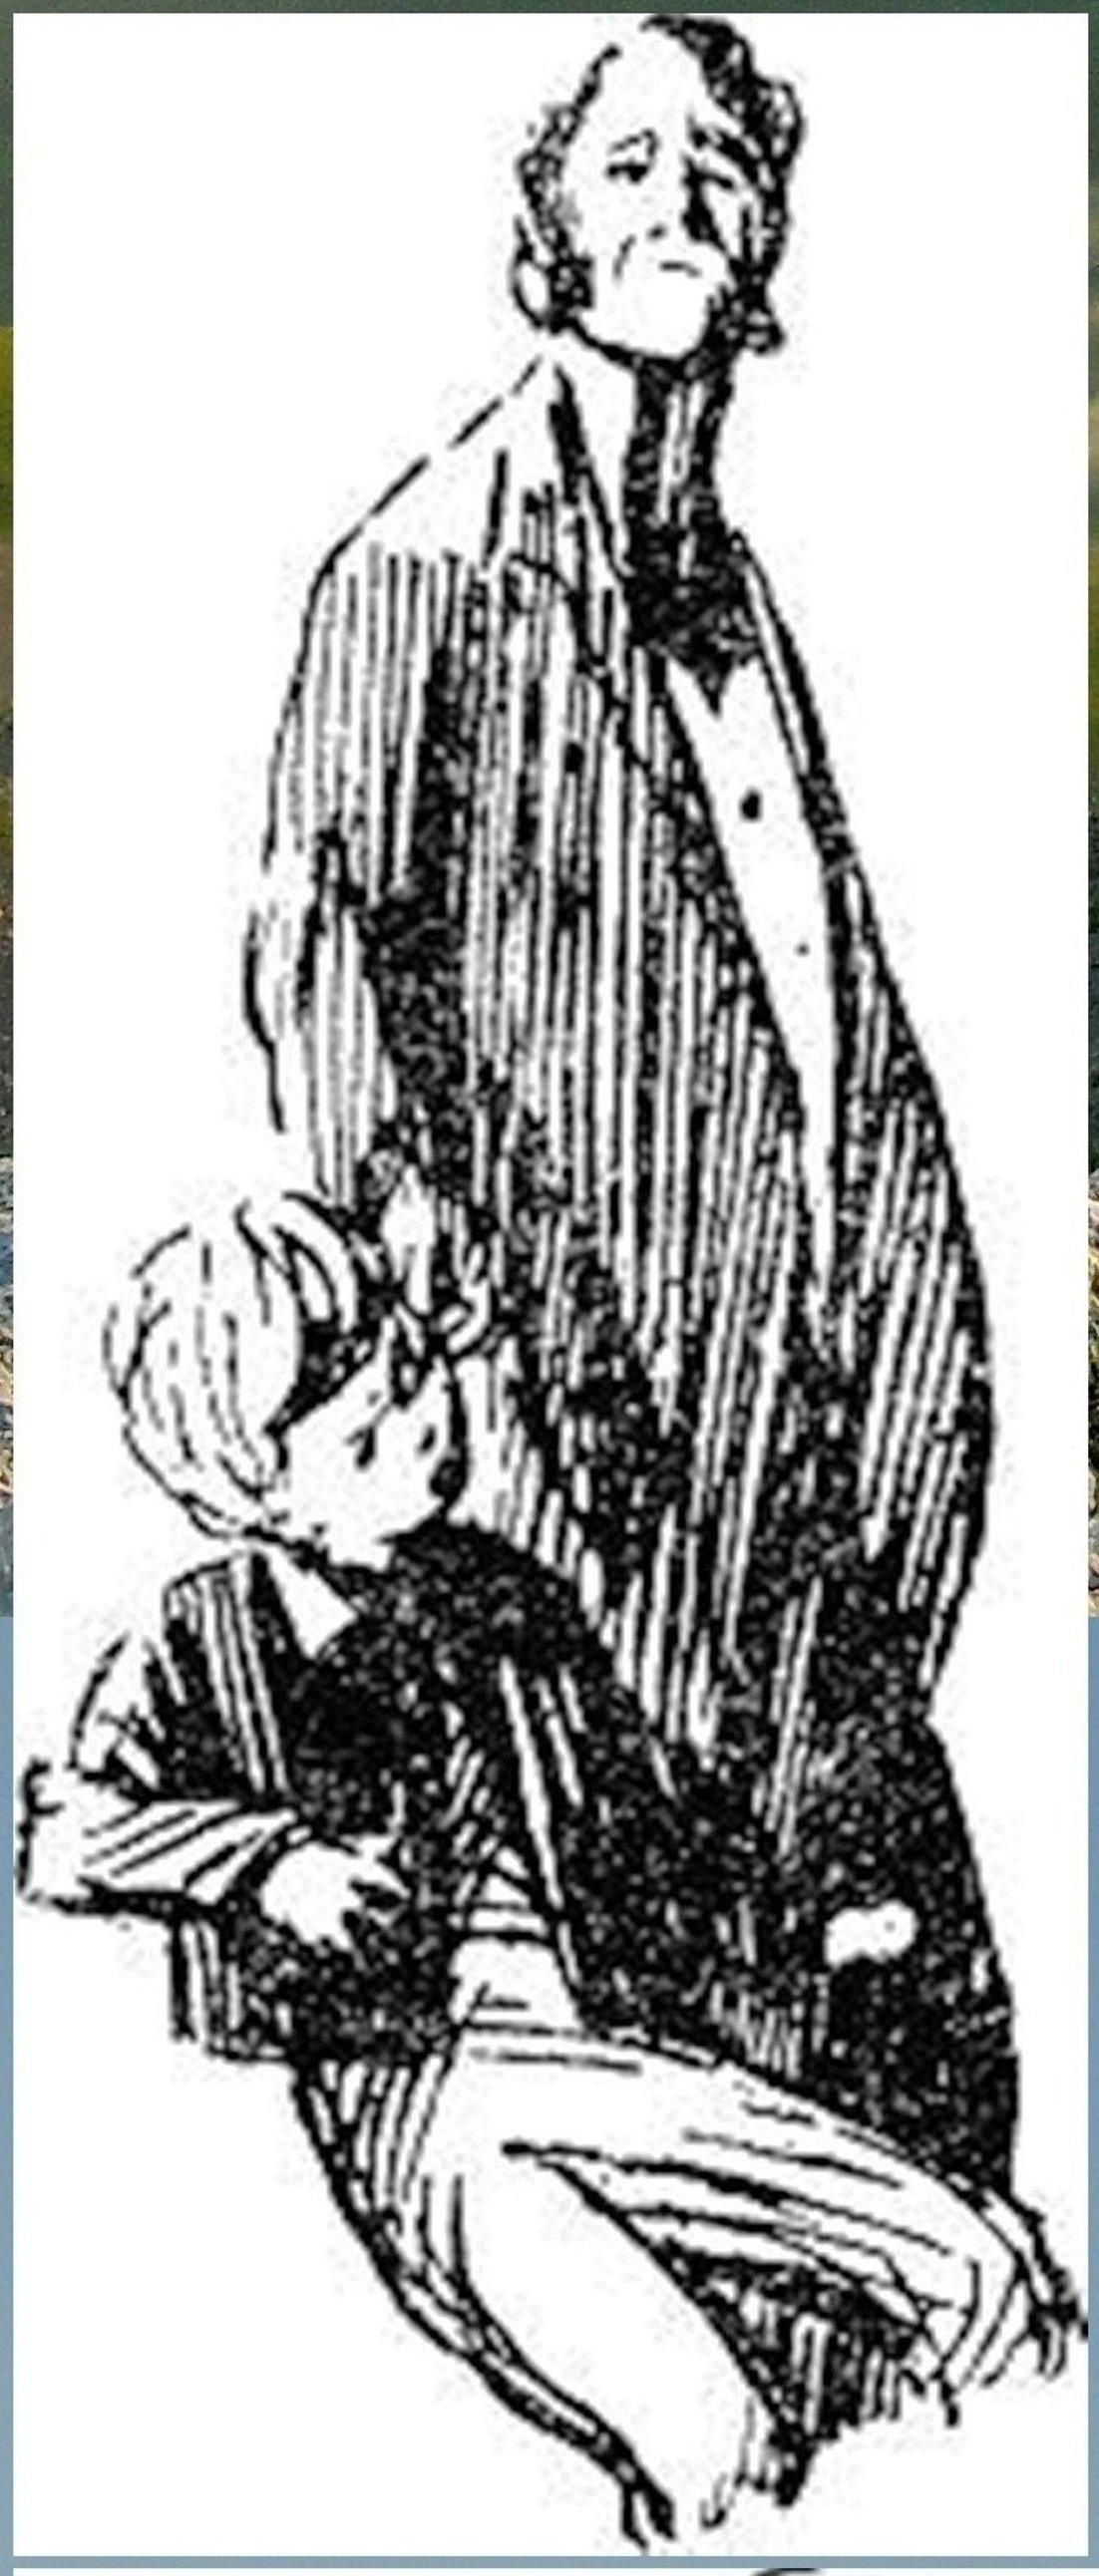 Иллюстрация В. Н. Горяева к пр-ю М.Твена Приключения Тома Сойера (18).